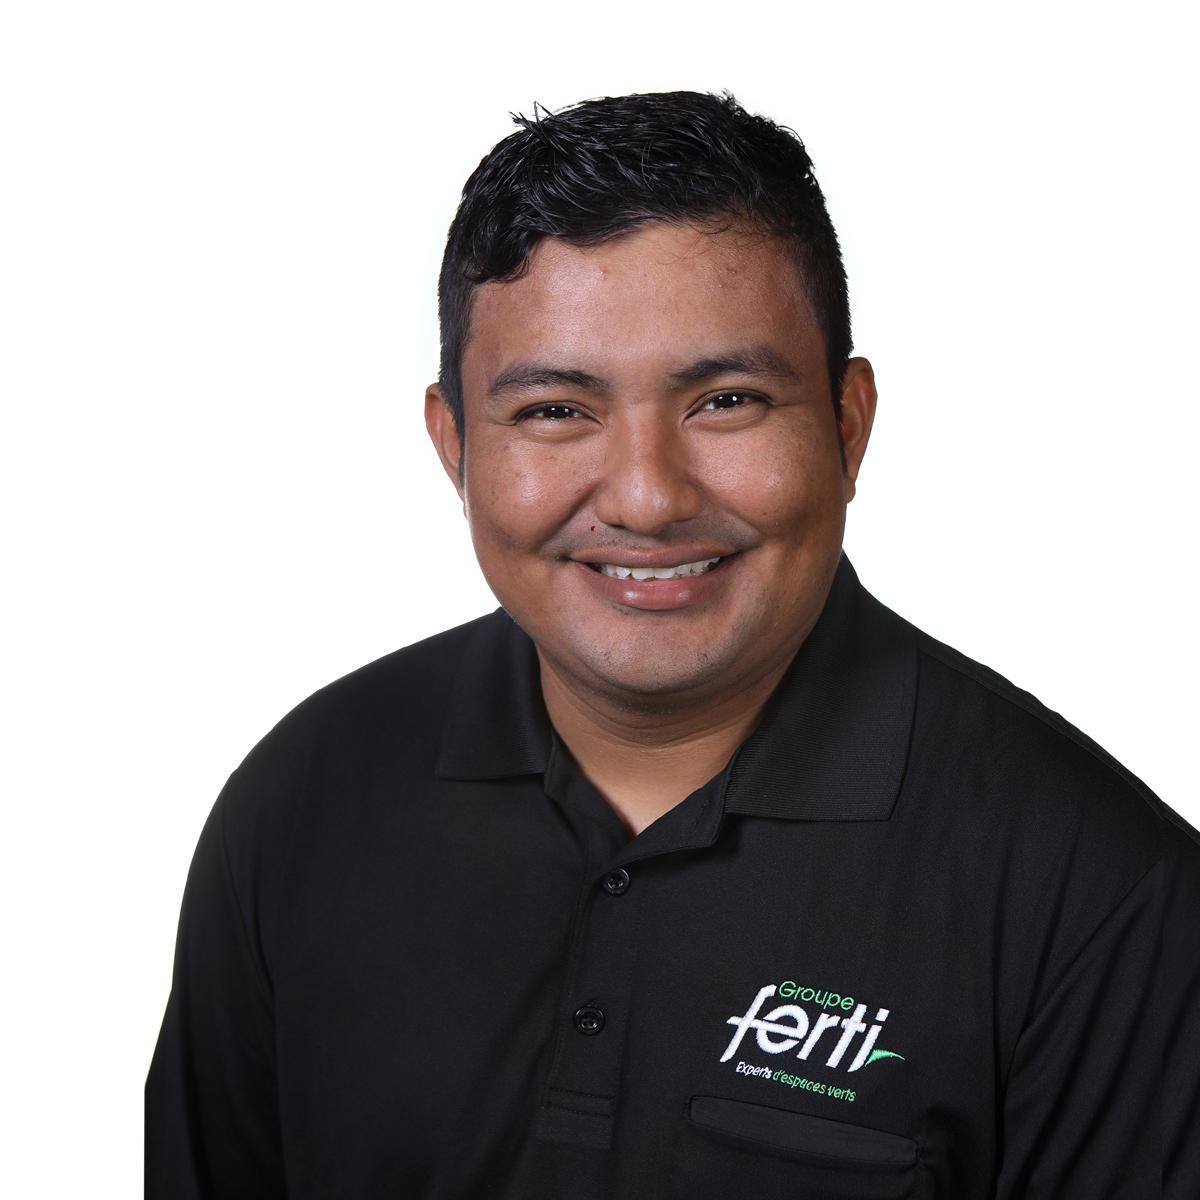 JJairo Jose Agustin Mendoza